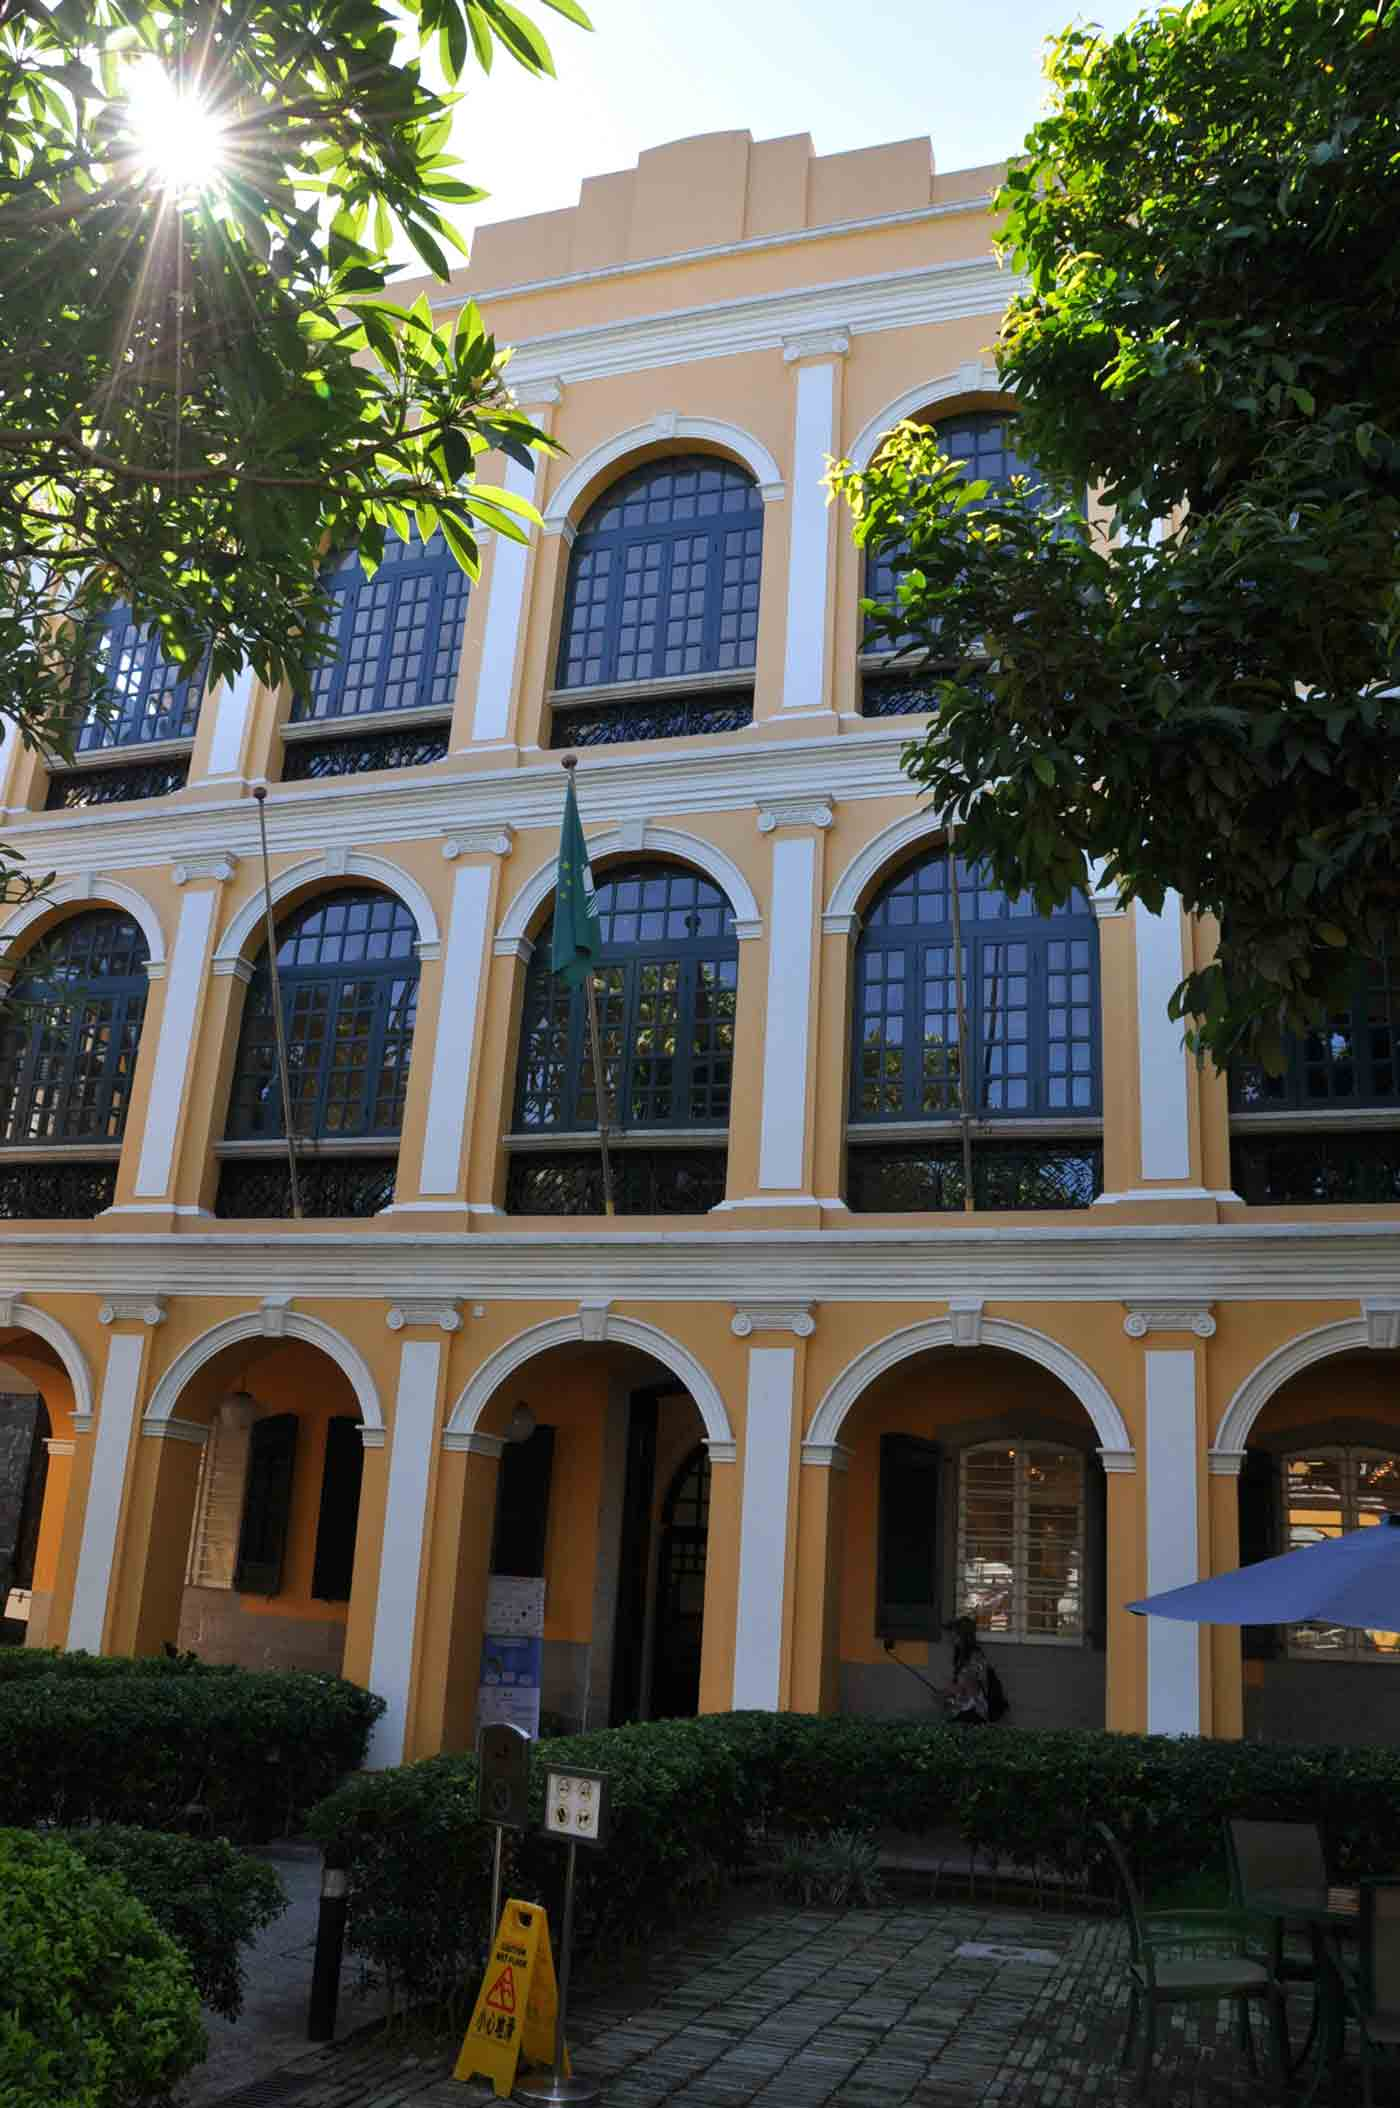 Macau World Heritage Site: Sir Robert Ho Tung Library